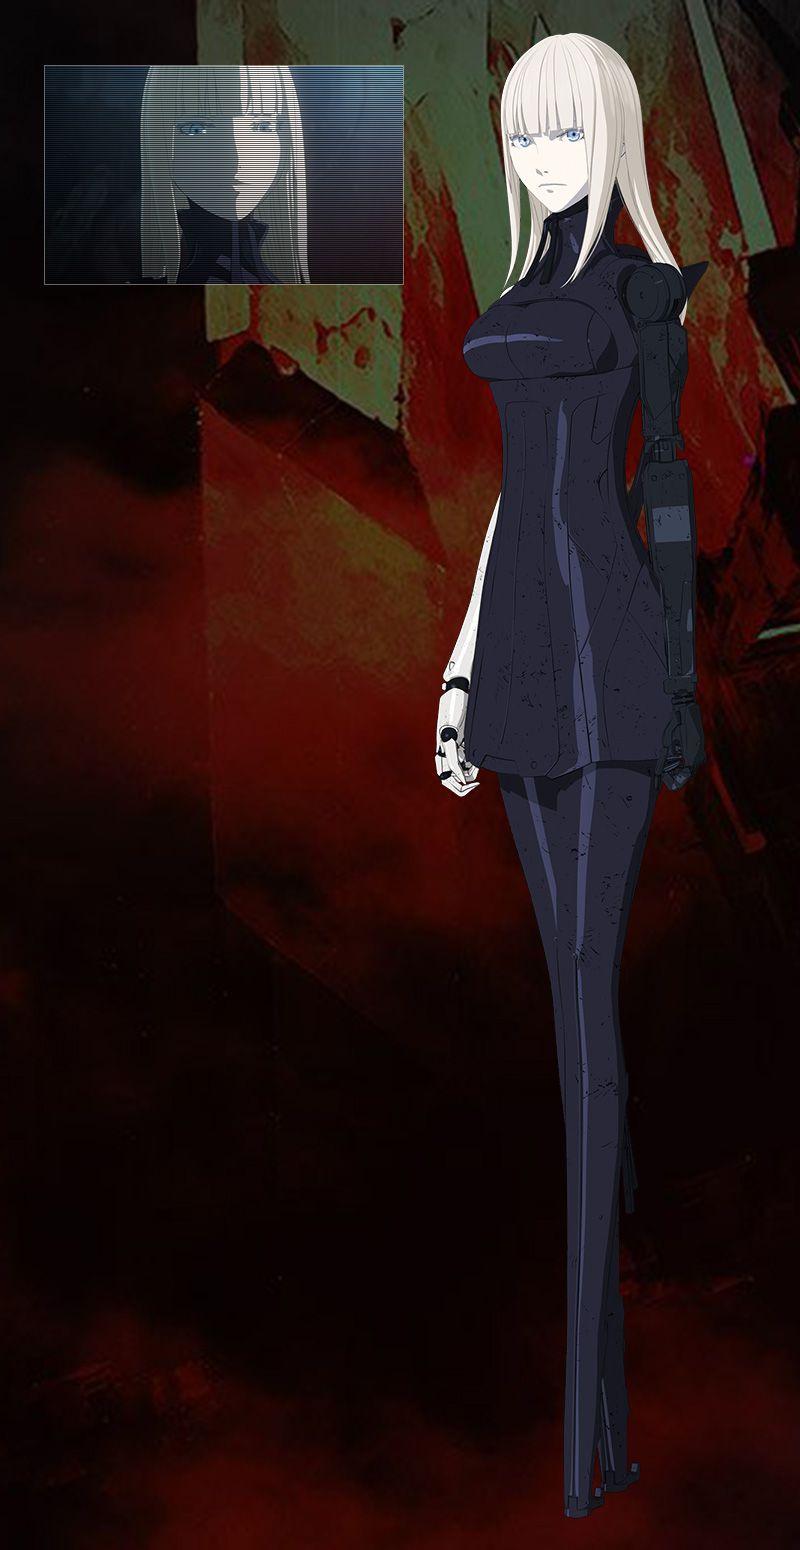 Blame-Anime-Film-Character-Designs-Cibo